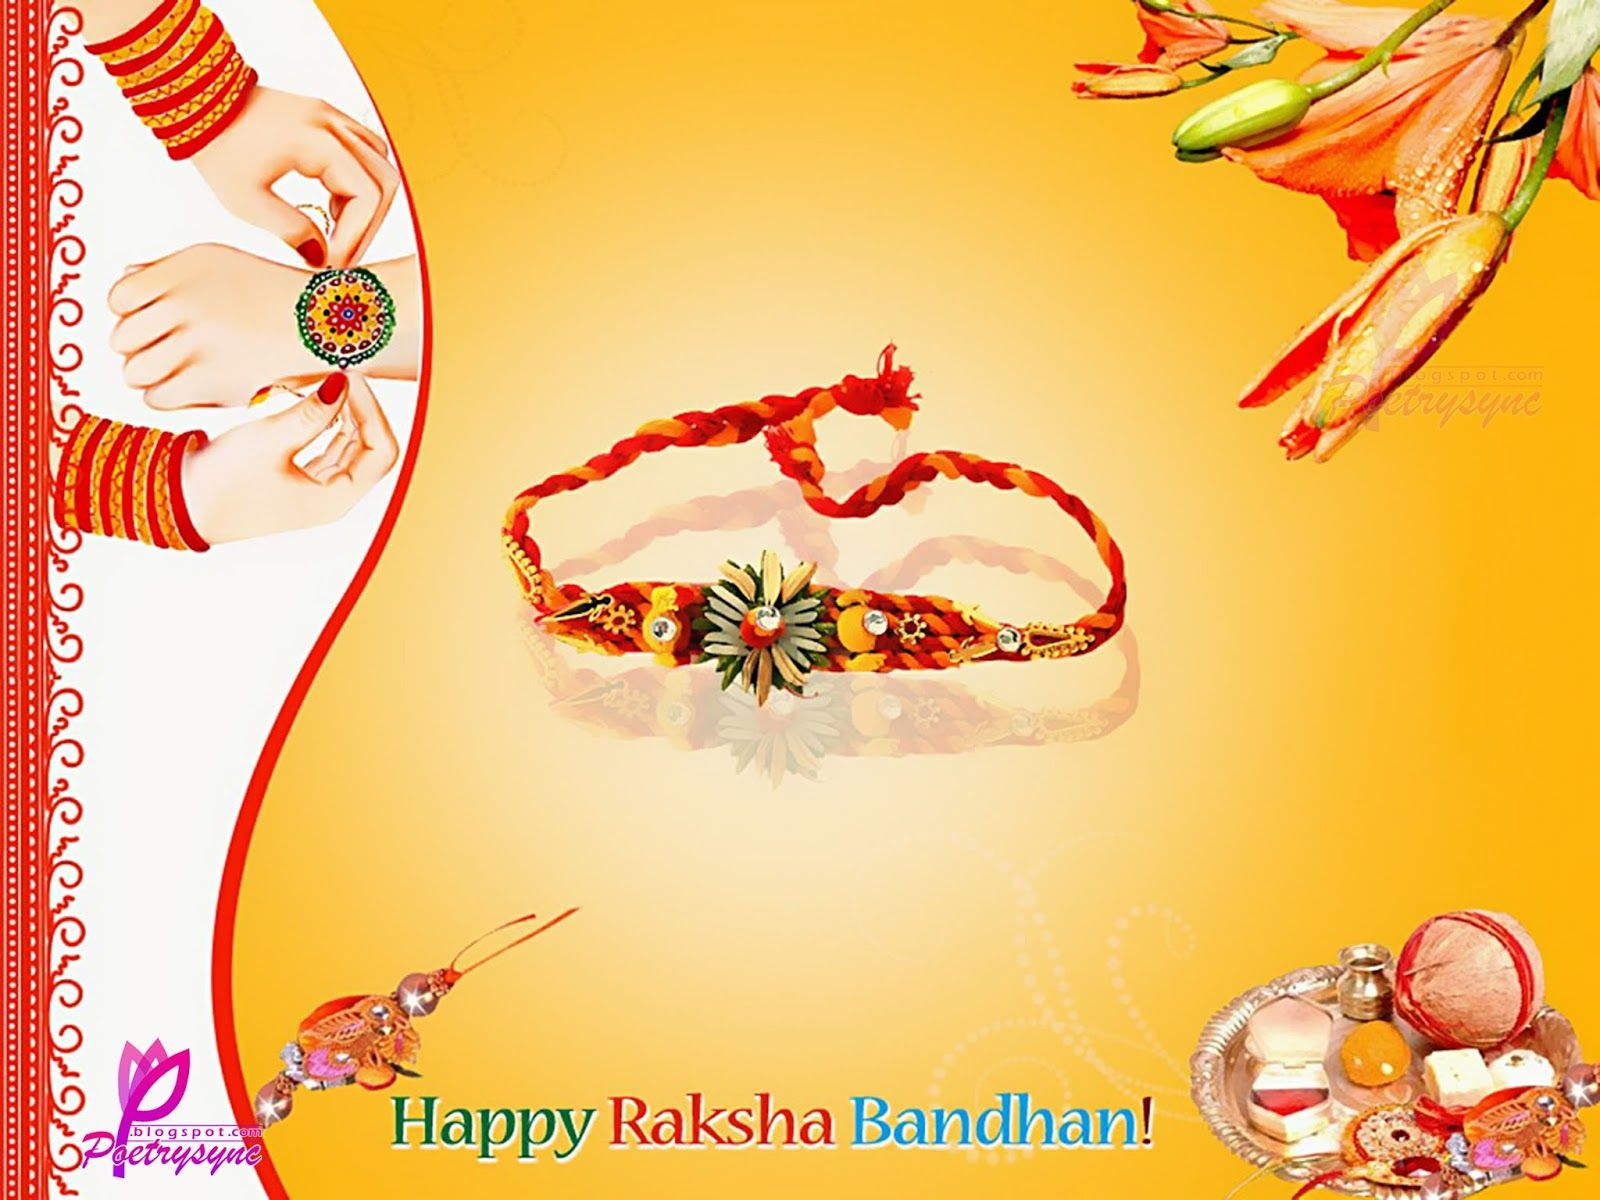 Raksha Bandhan Raksha Bandhan Cards Images For Brother With Quotes